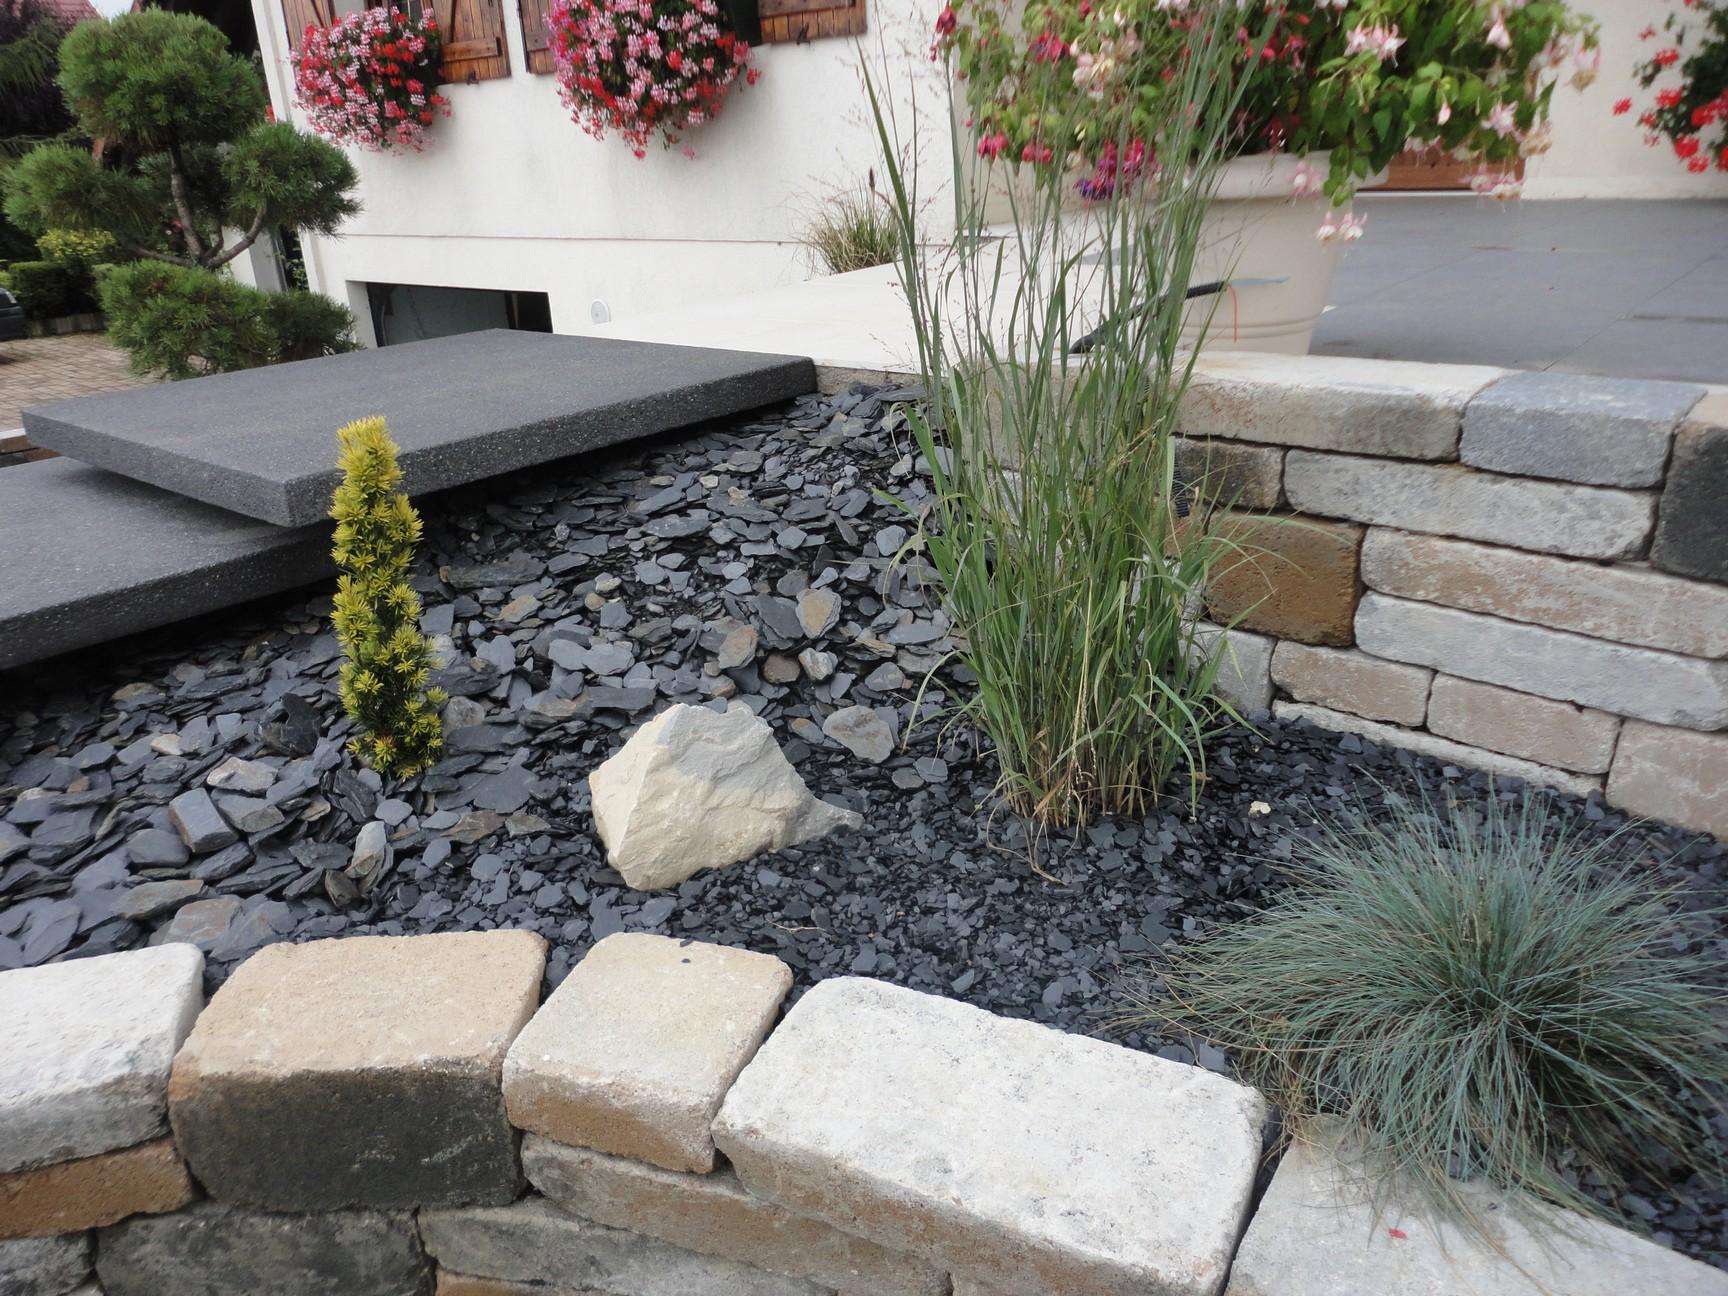 Graviers paillage d co for Deco massif jardin